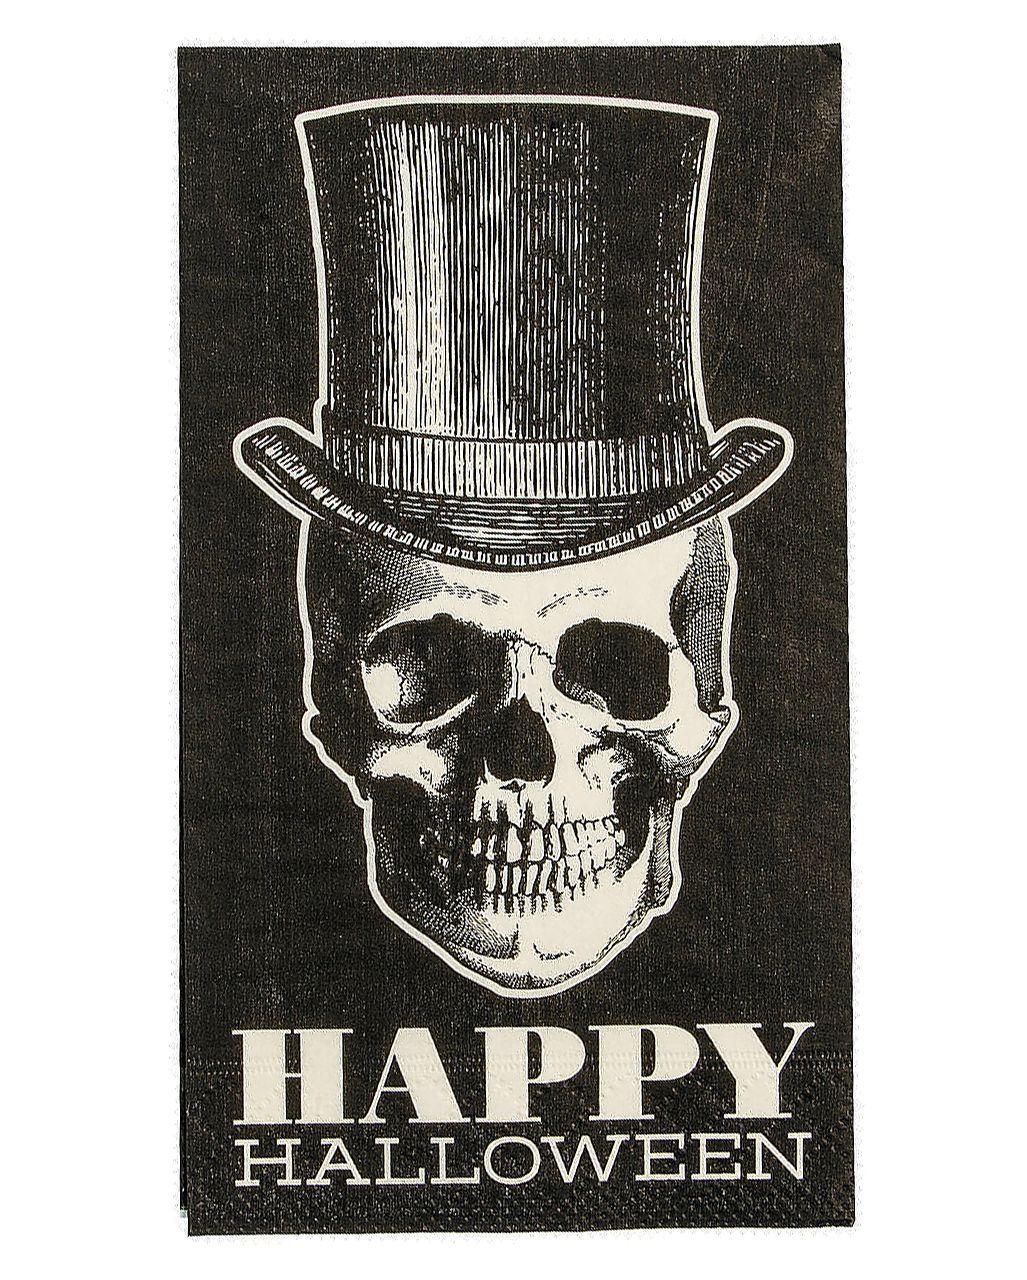 Hipster Totenkopf Servietten 16 St. kaufen #happyhalloweenschriftzug